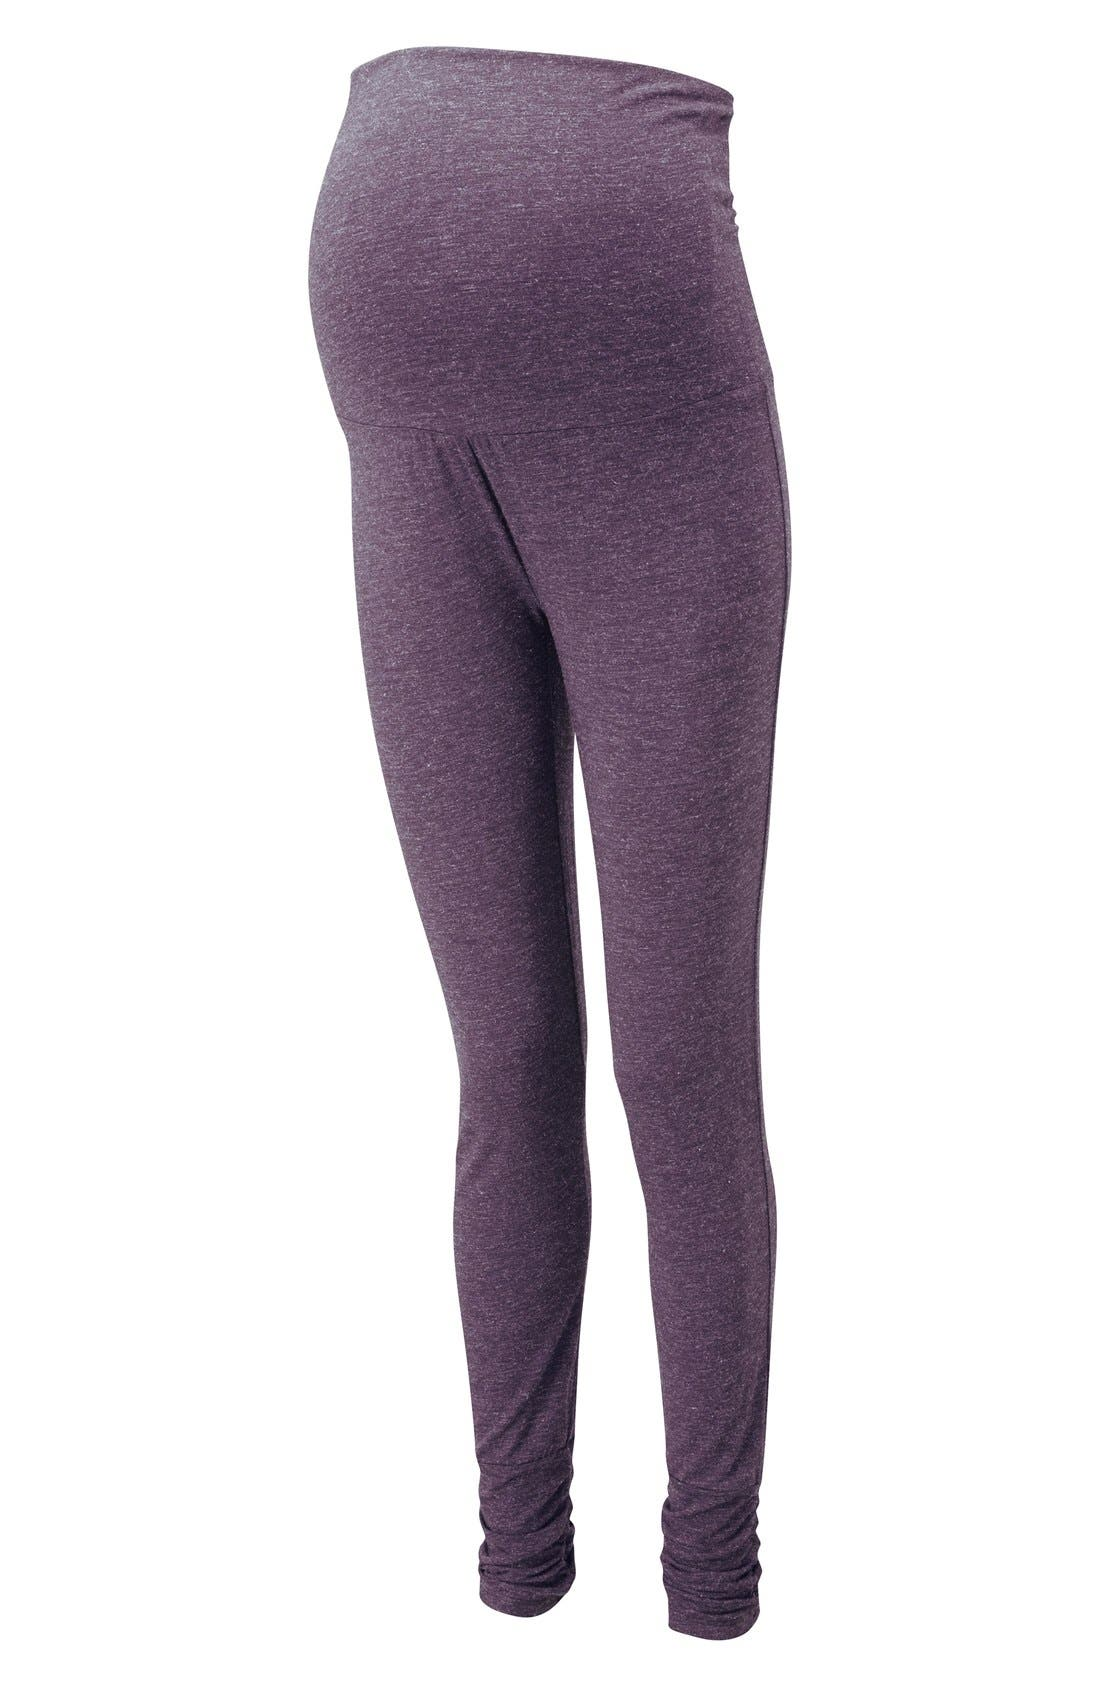 Alternate Image 1 Selected - Amoralia Skinny Maternity Pajama Leggings